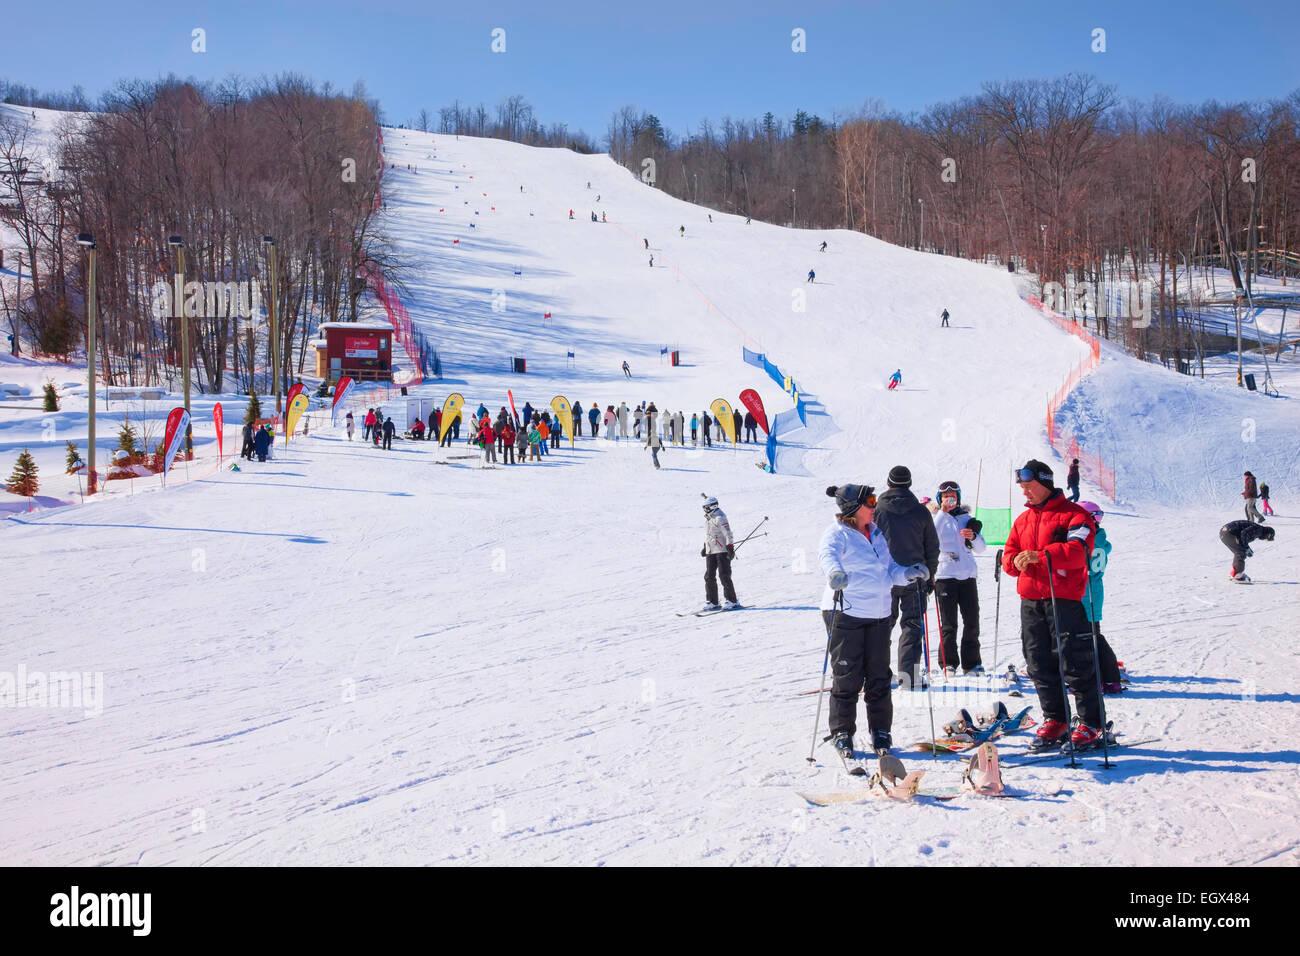 ontario's premier ski resort blue mountain in stock photo: 79250084